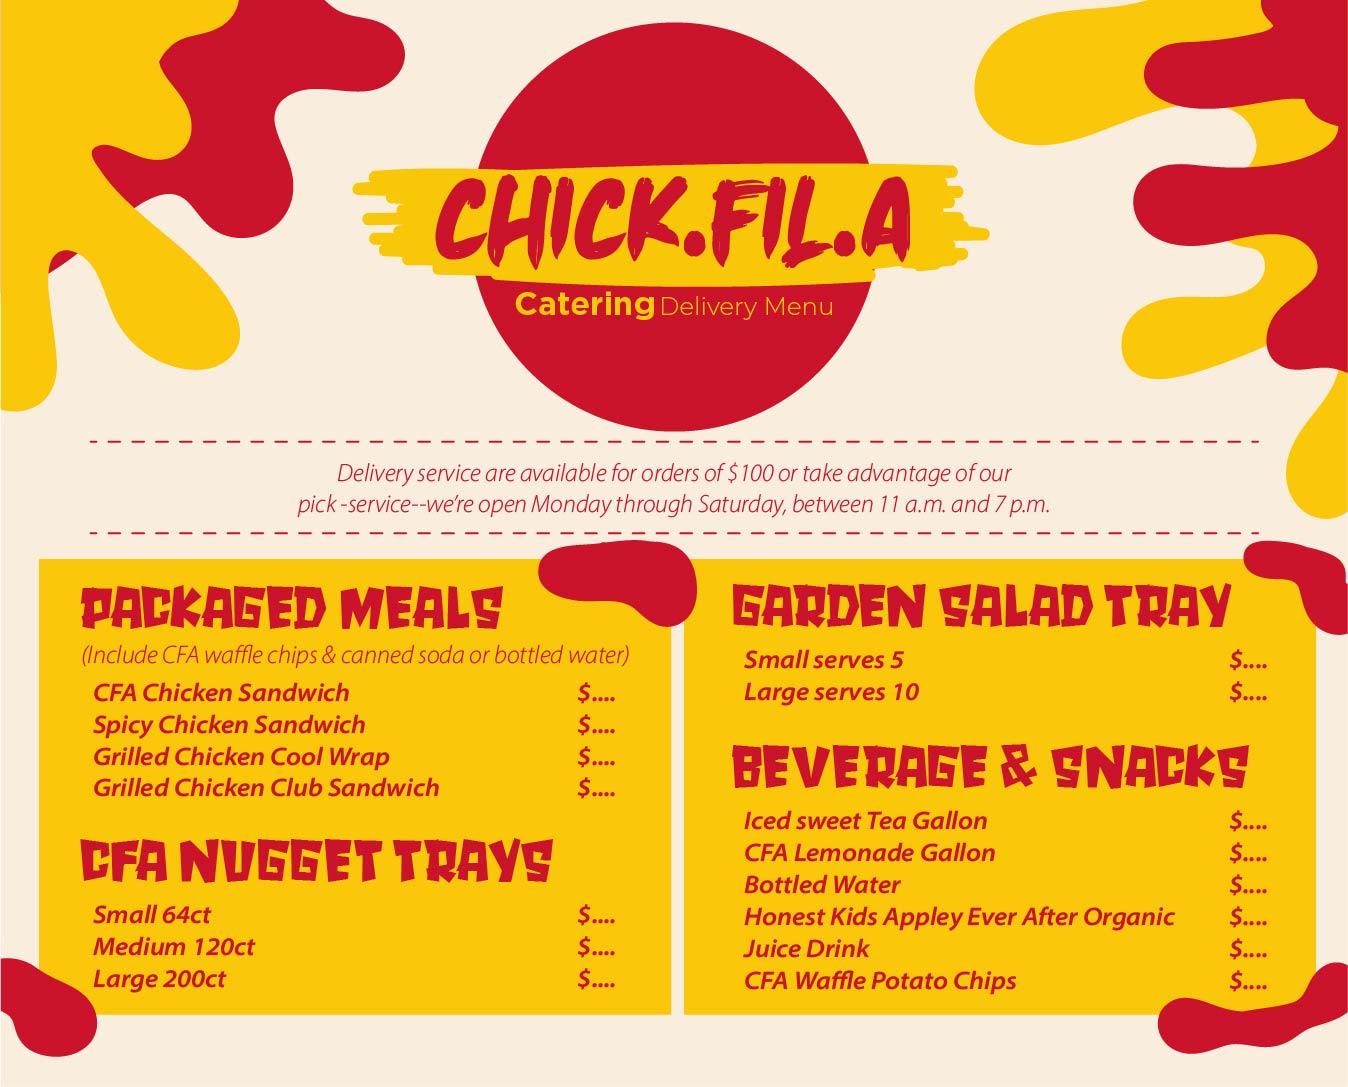 Printable Chick-fil a Catering Menu